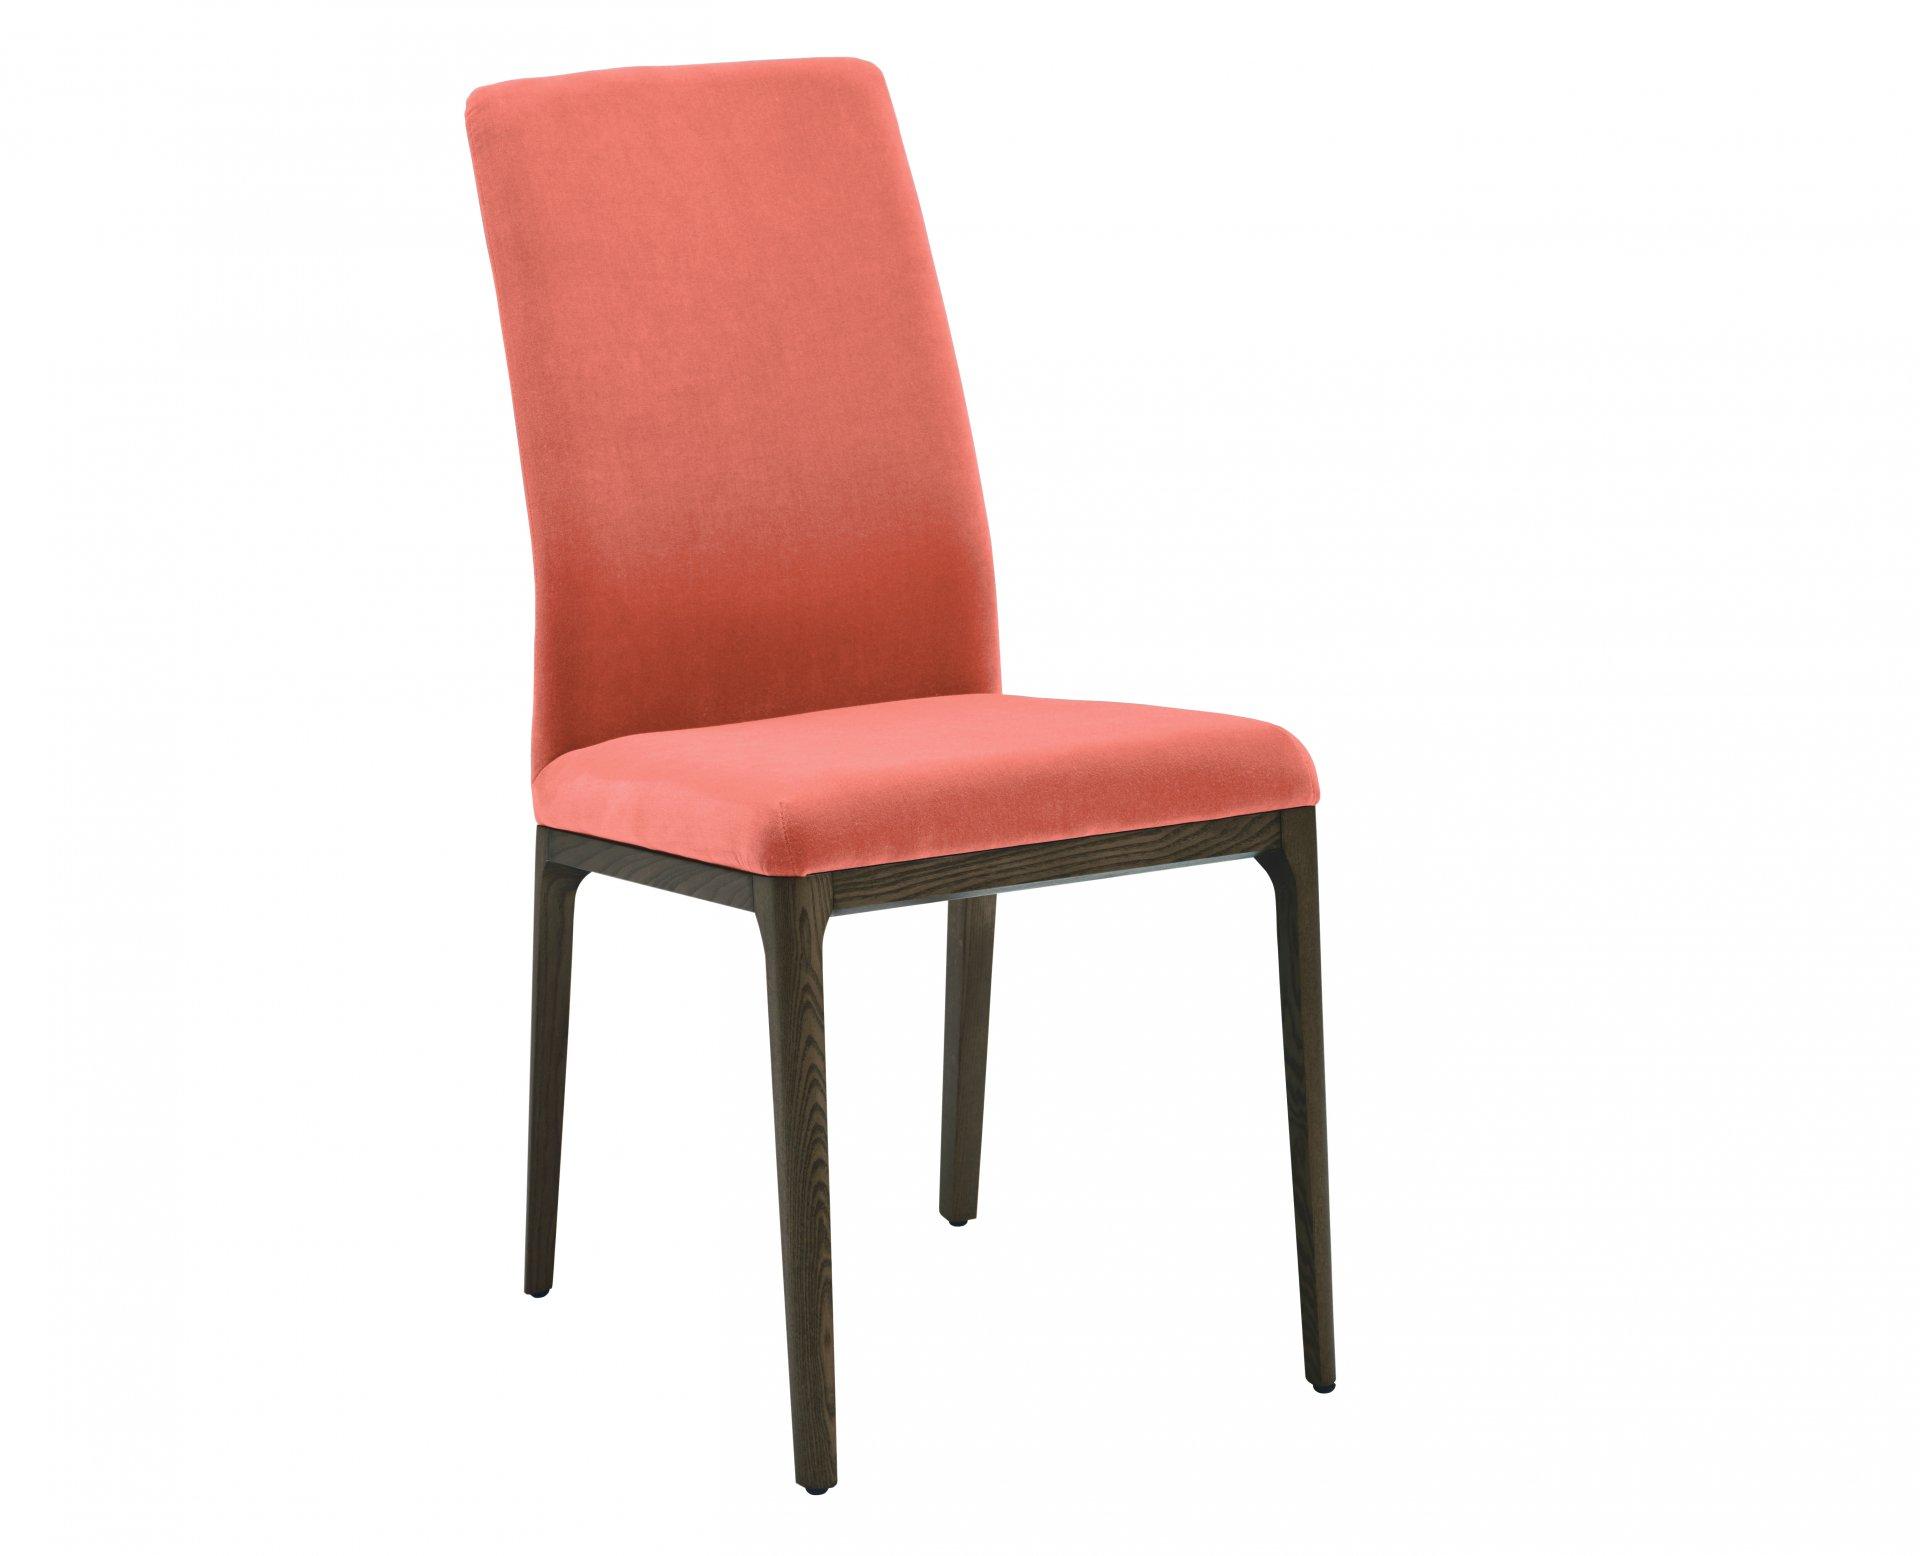 Sedia Pantone Rosa : Pantone color is living coral design diffusion